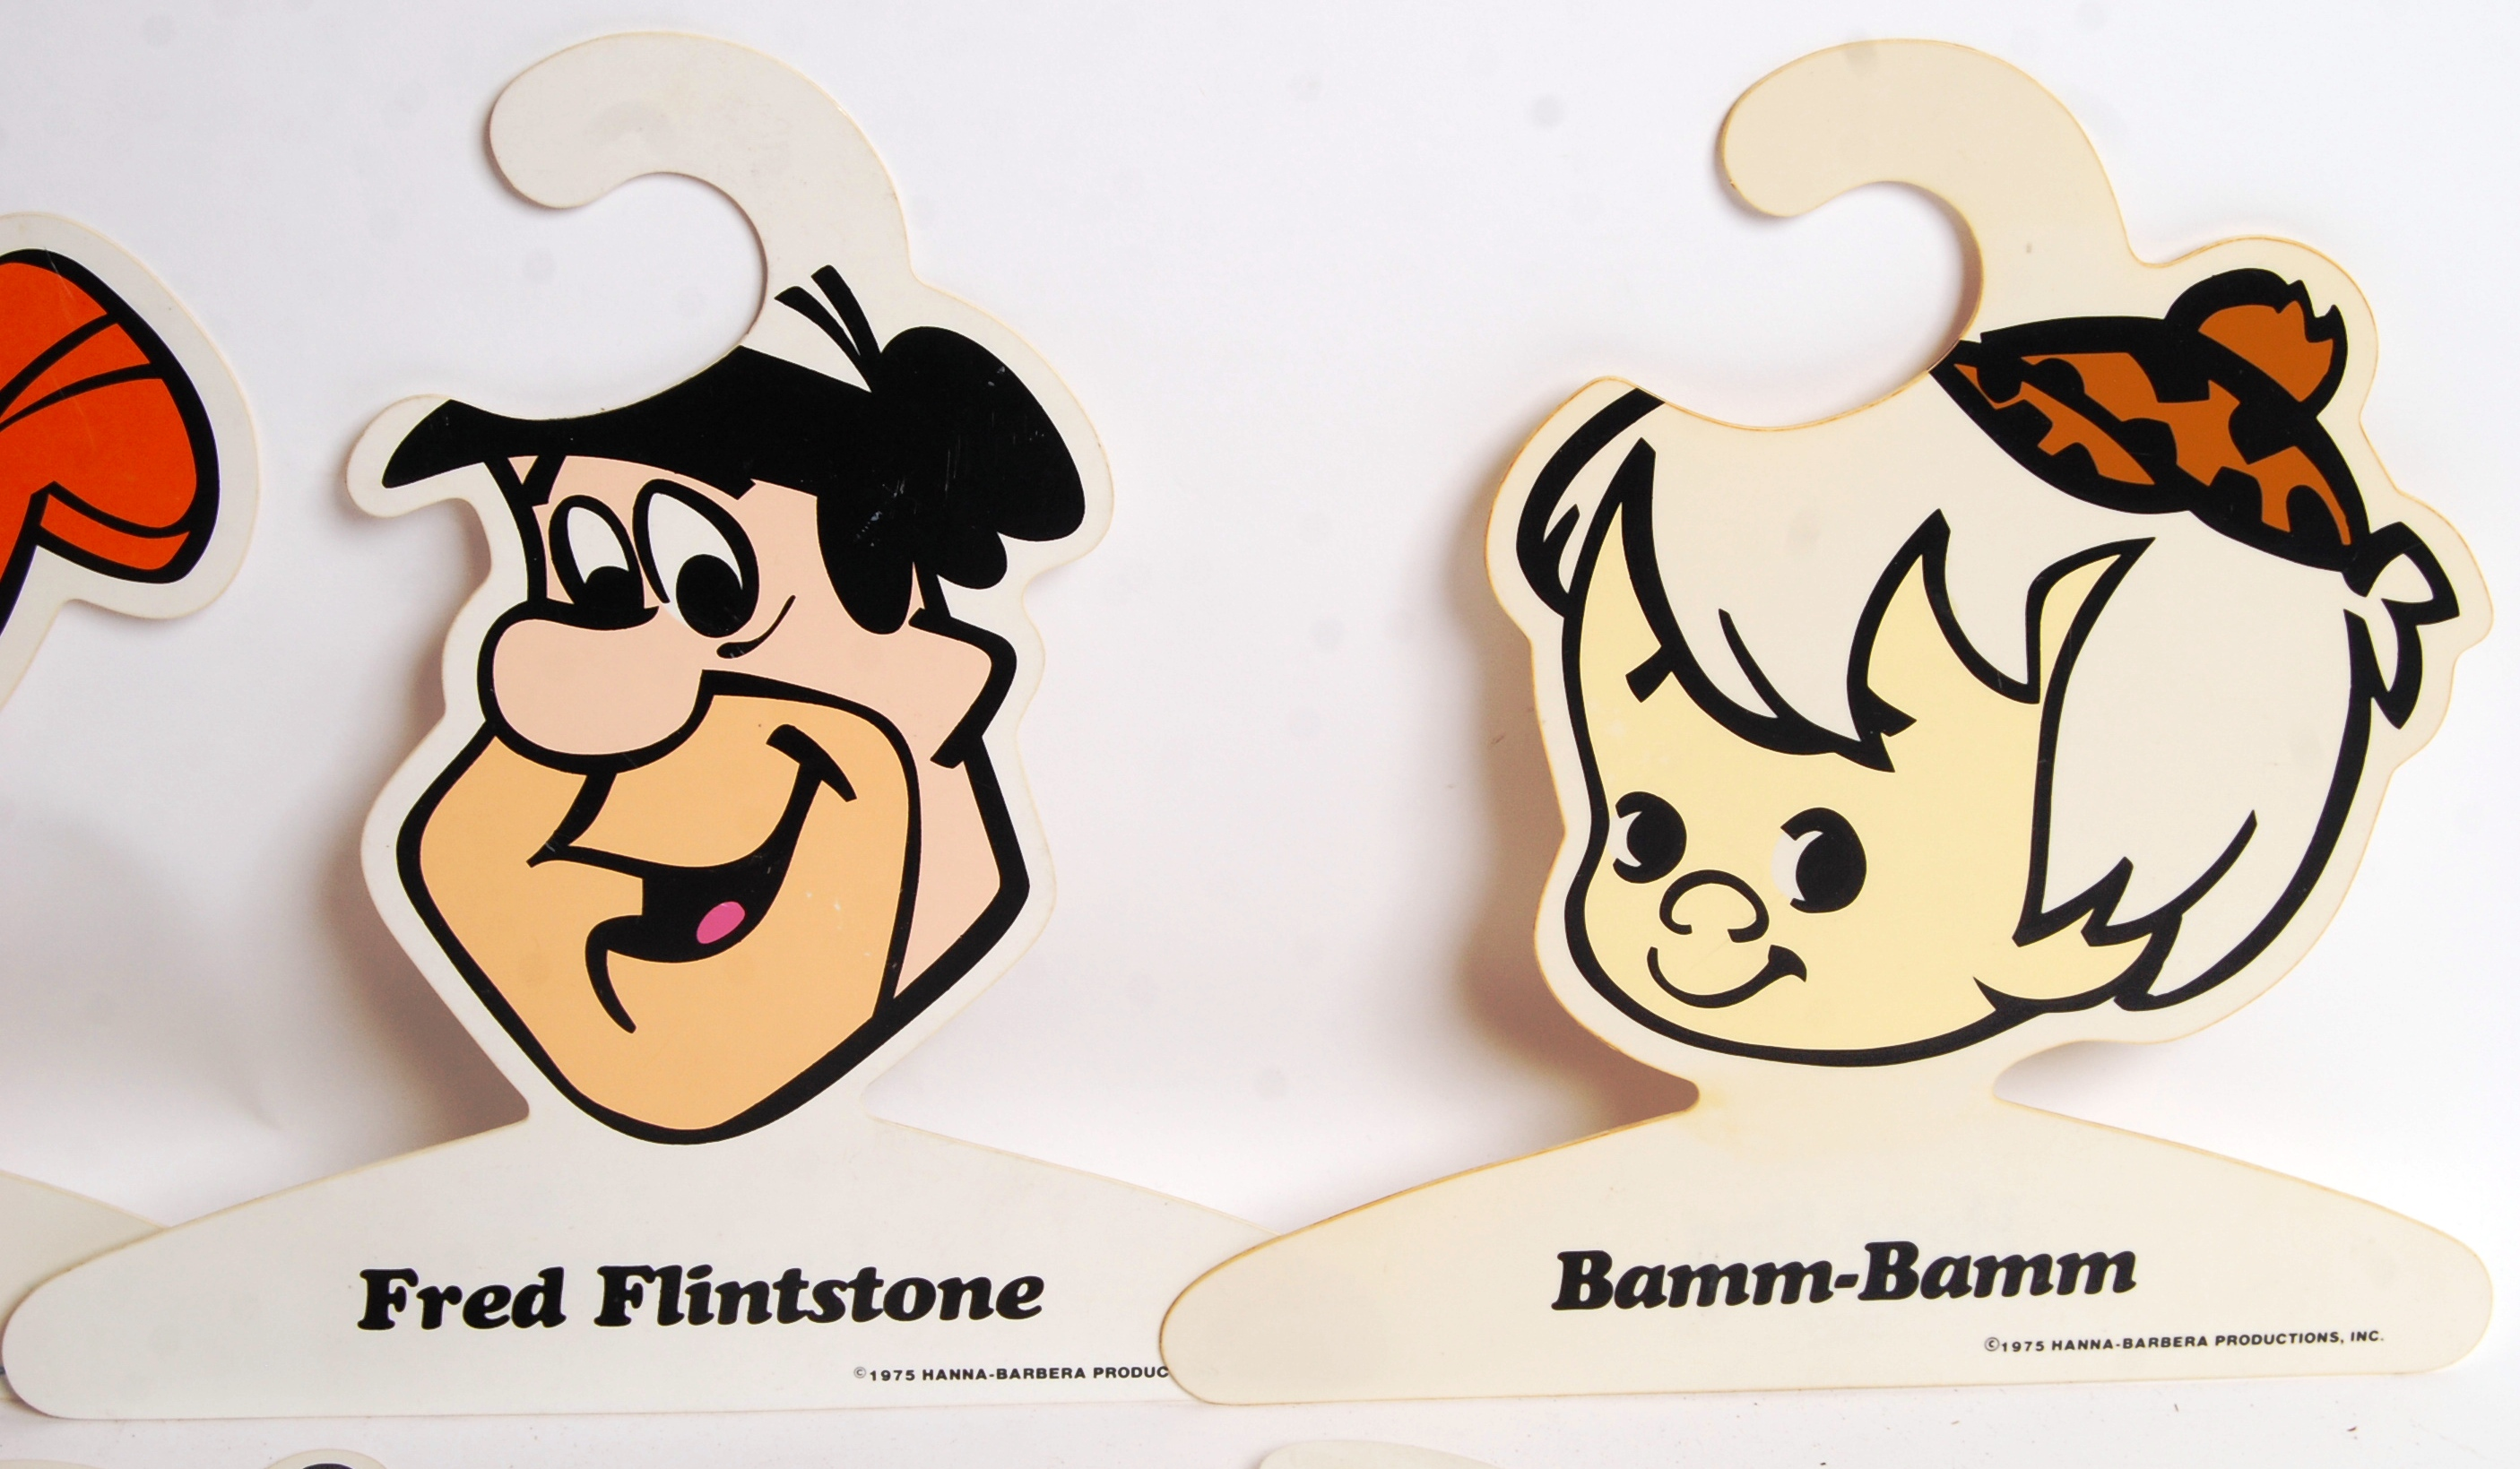 SET OF RARE 1970'S HANNA-BARBERA ' THE FLINTSTONES - Image 2 of 4